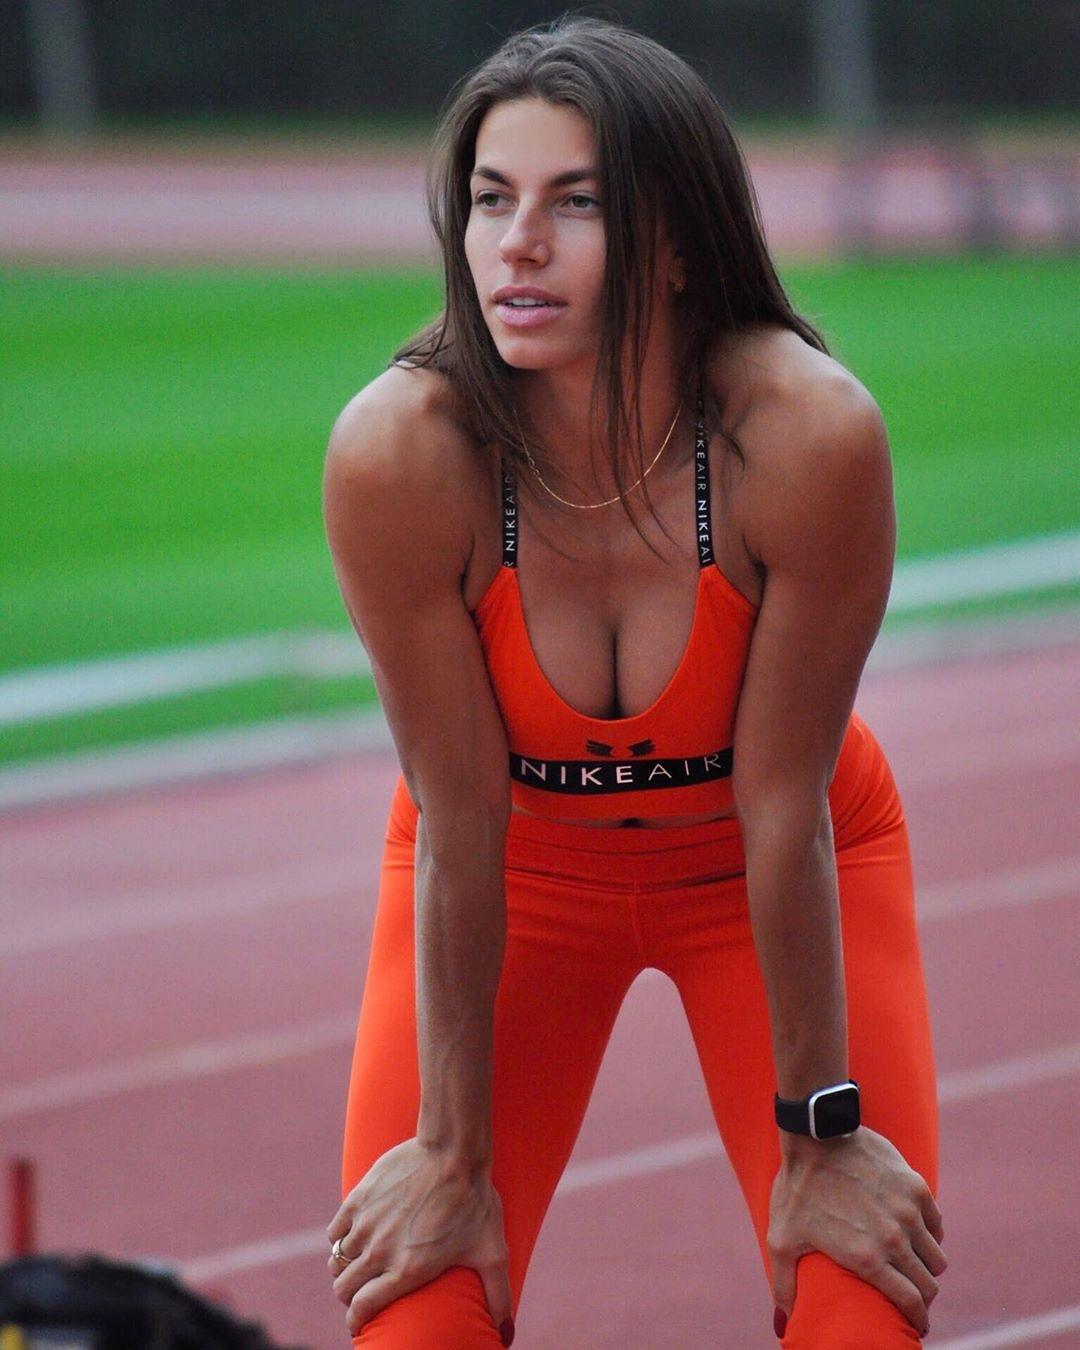 Maryna Bekh-Romanchuk